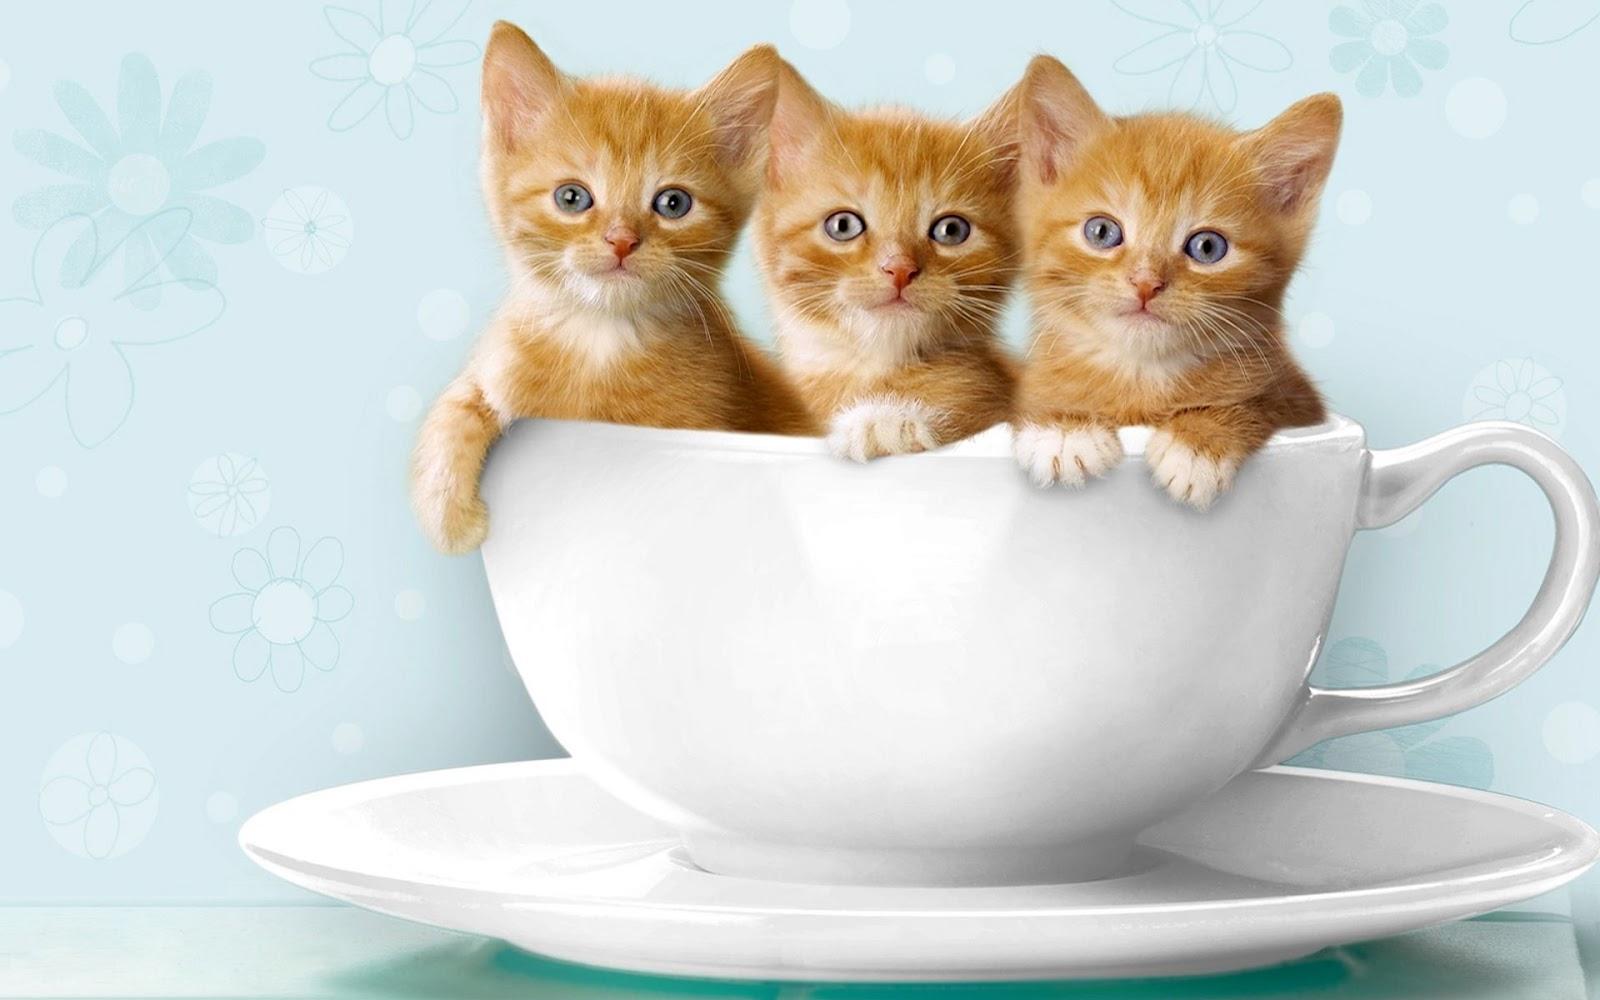 Koleksi 7500  Gambar Animasi Kartun Korea Kucing Lucu HD Terbaru